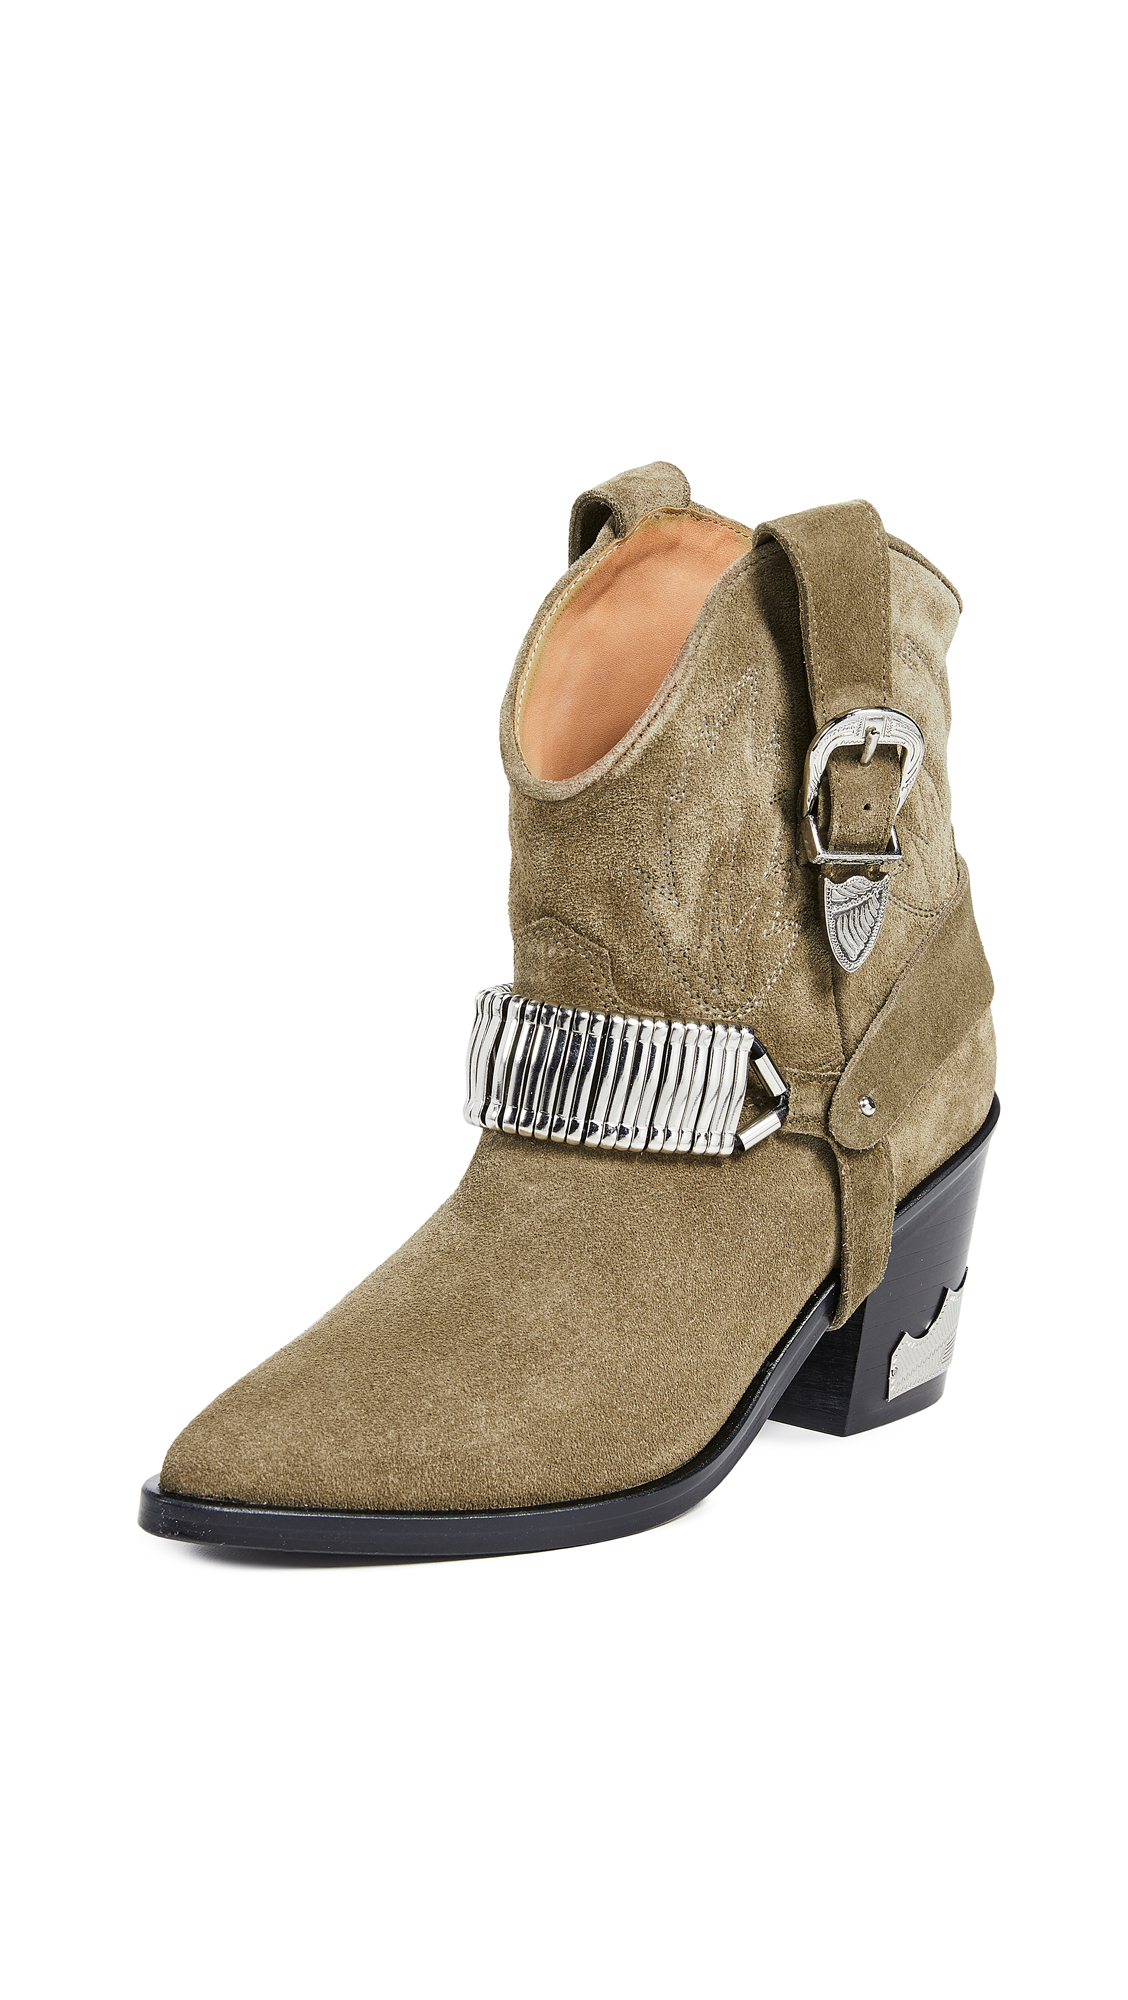 Toga Pulla Harness Cowboy Boots - Yellow/Khaki